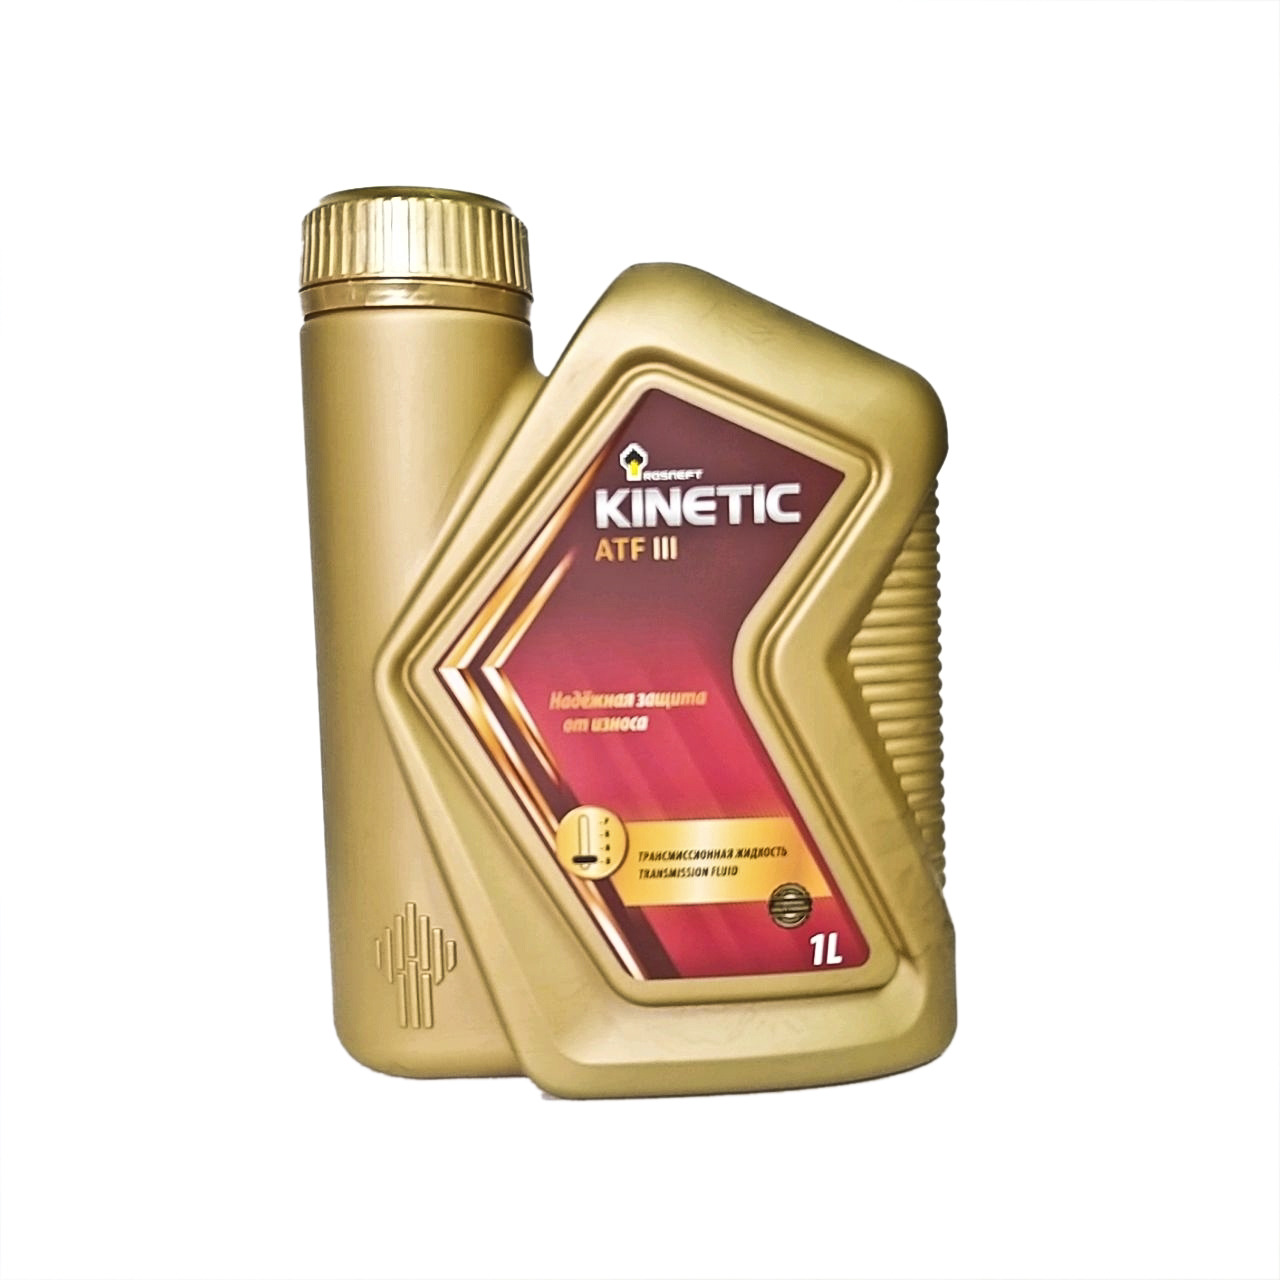 Rosneft Kinetic ATF III (1 L.)